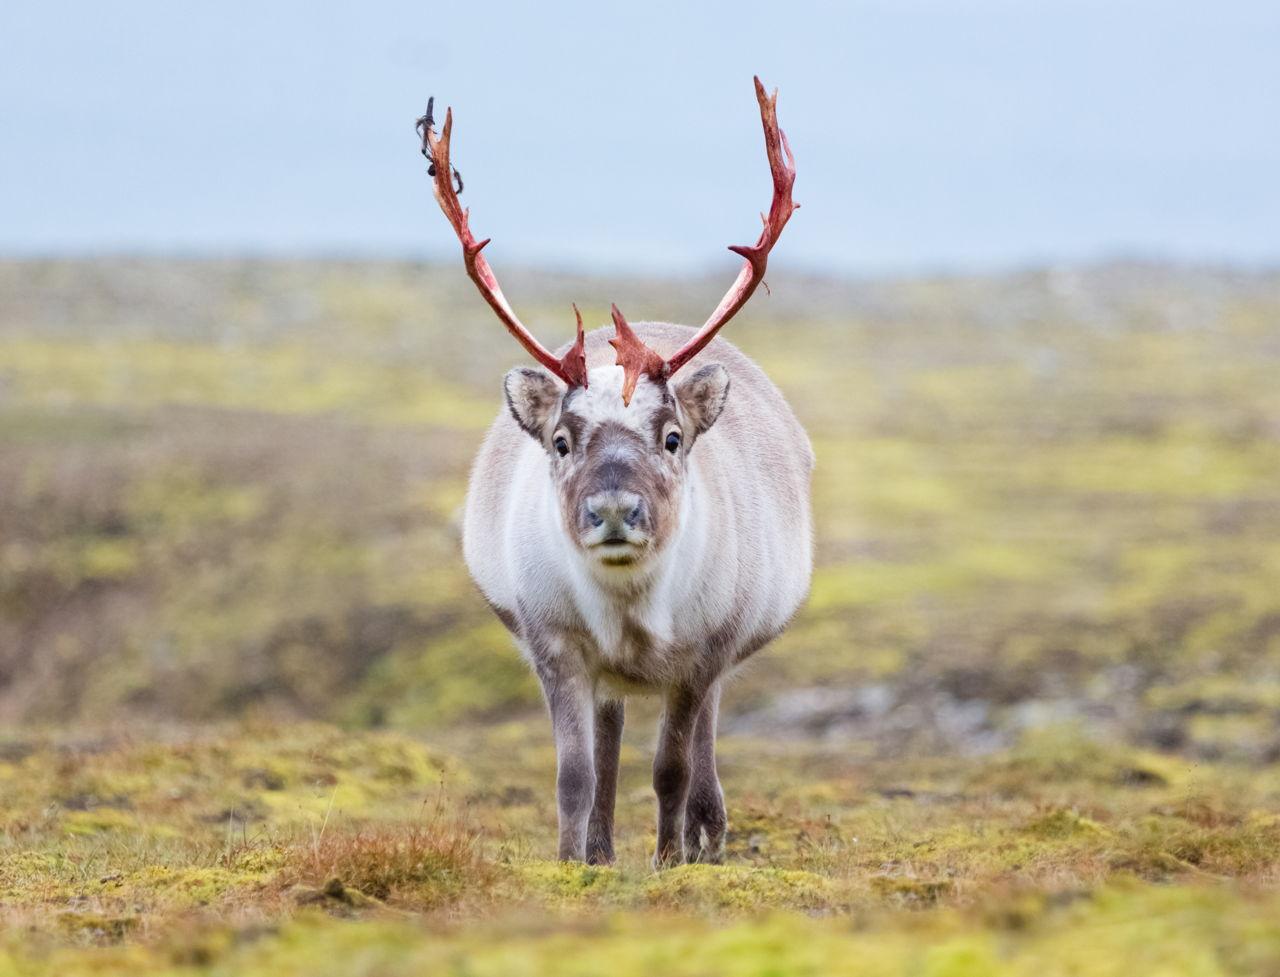 tundra animals - HD1280×977